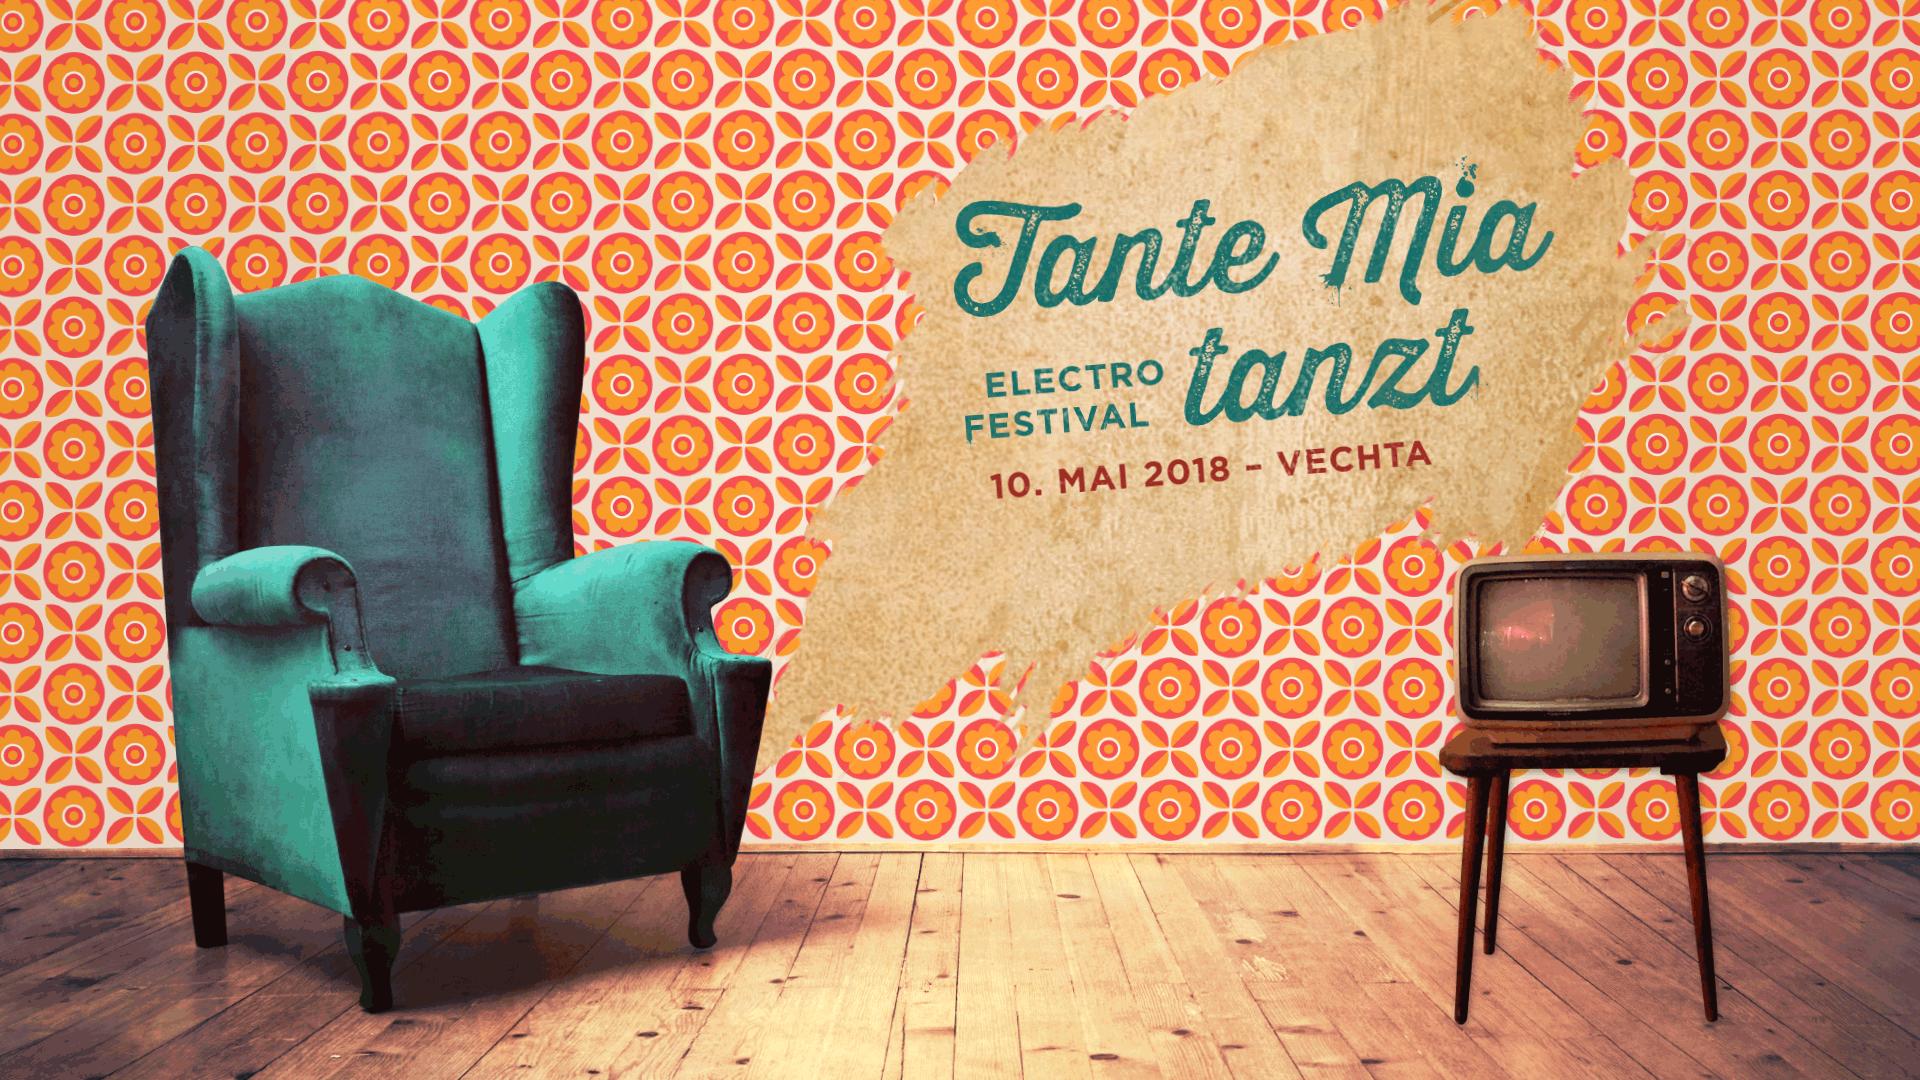 10.5.2018 - Tante Mia Tanzt [Vechta]